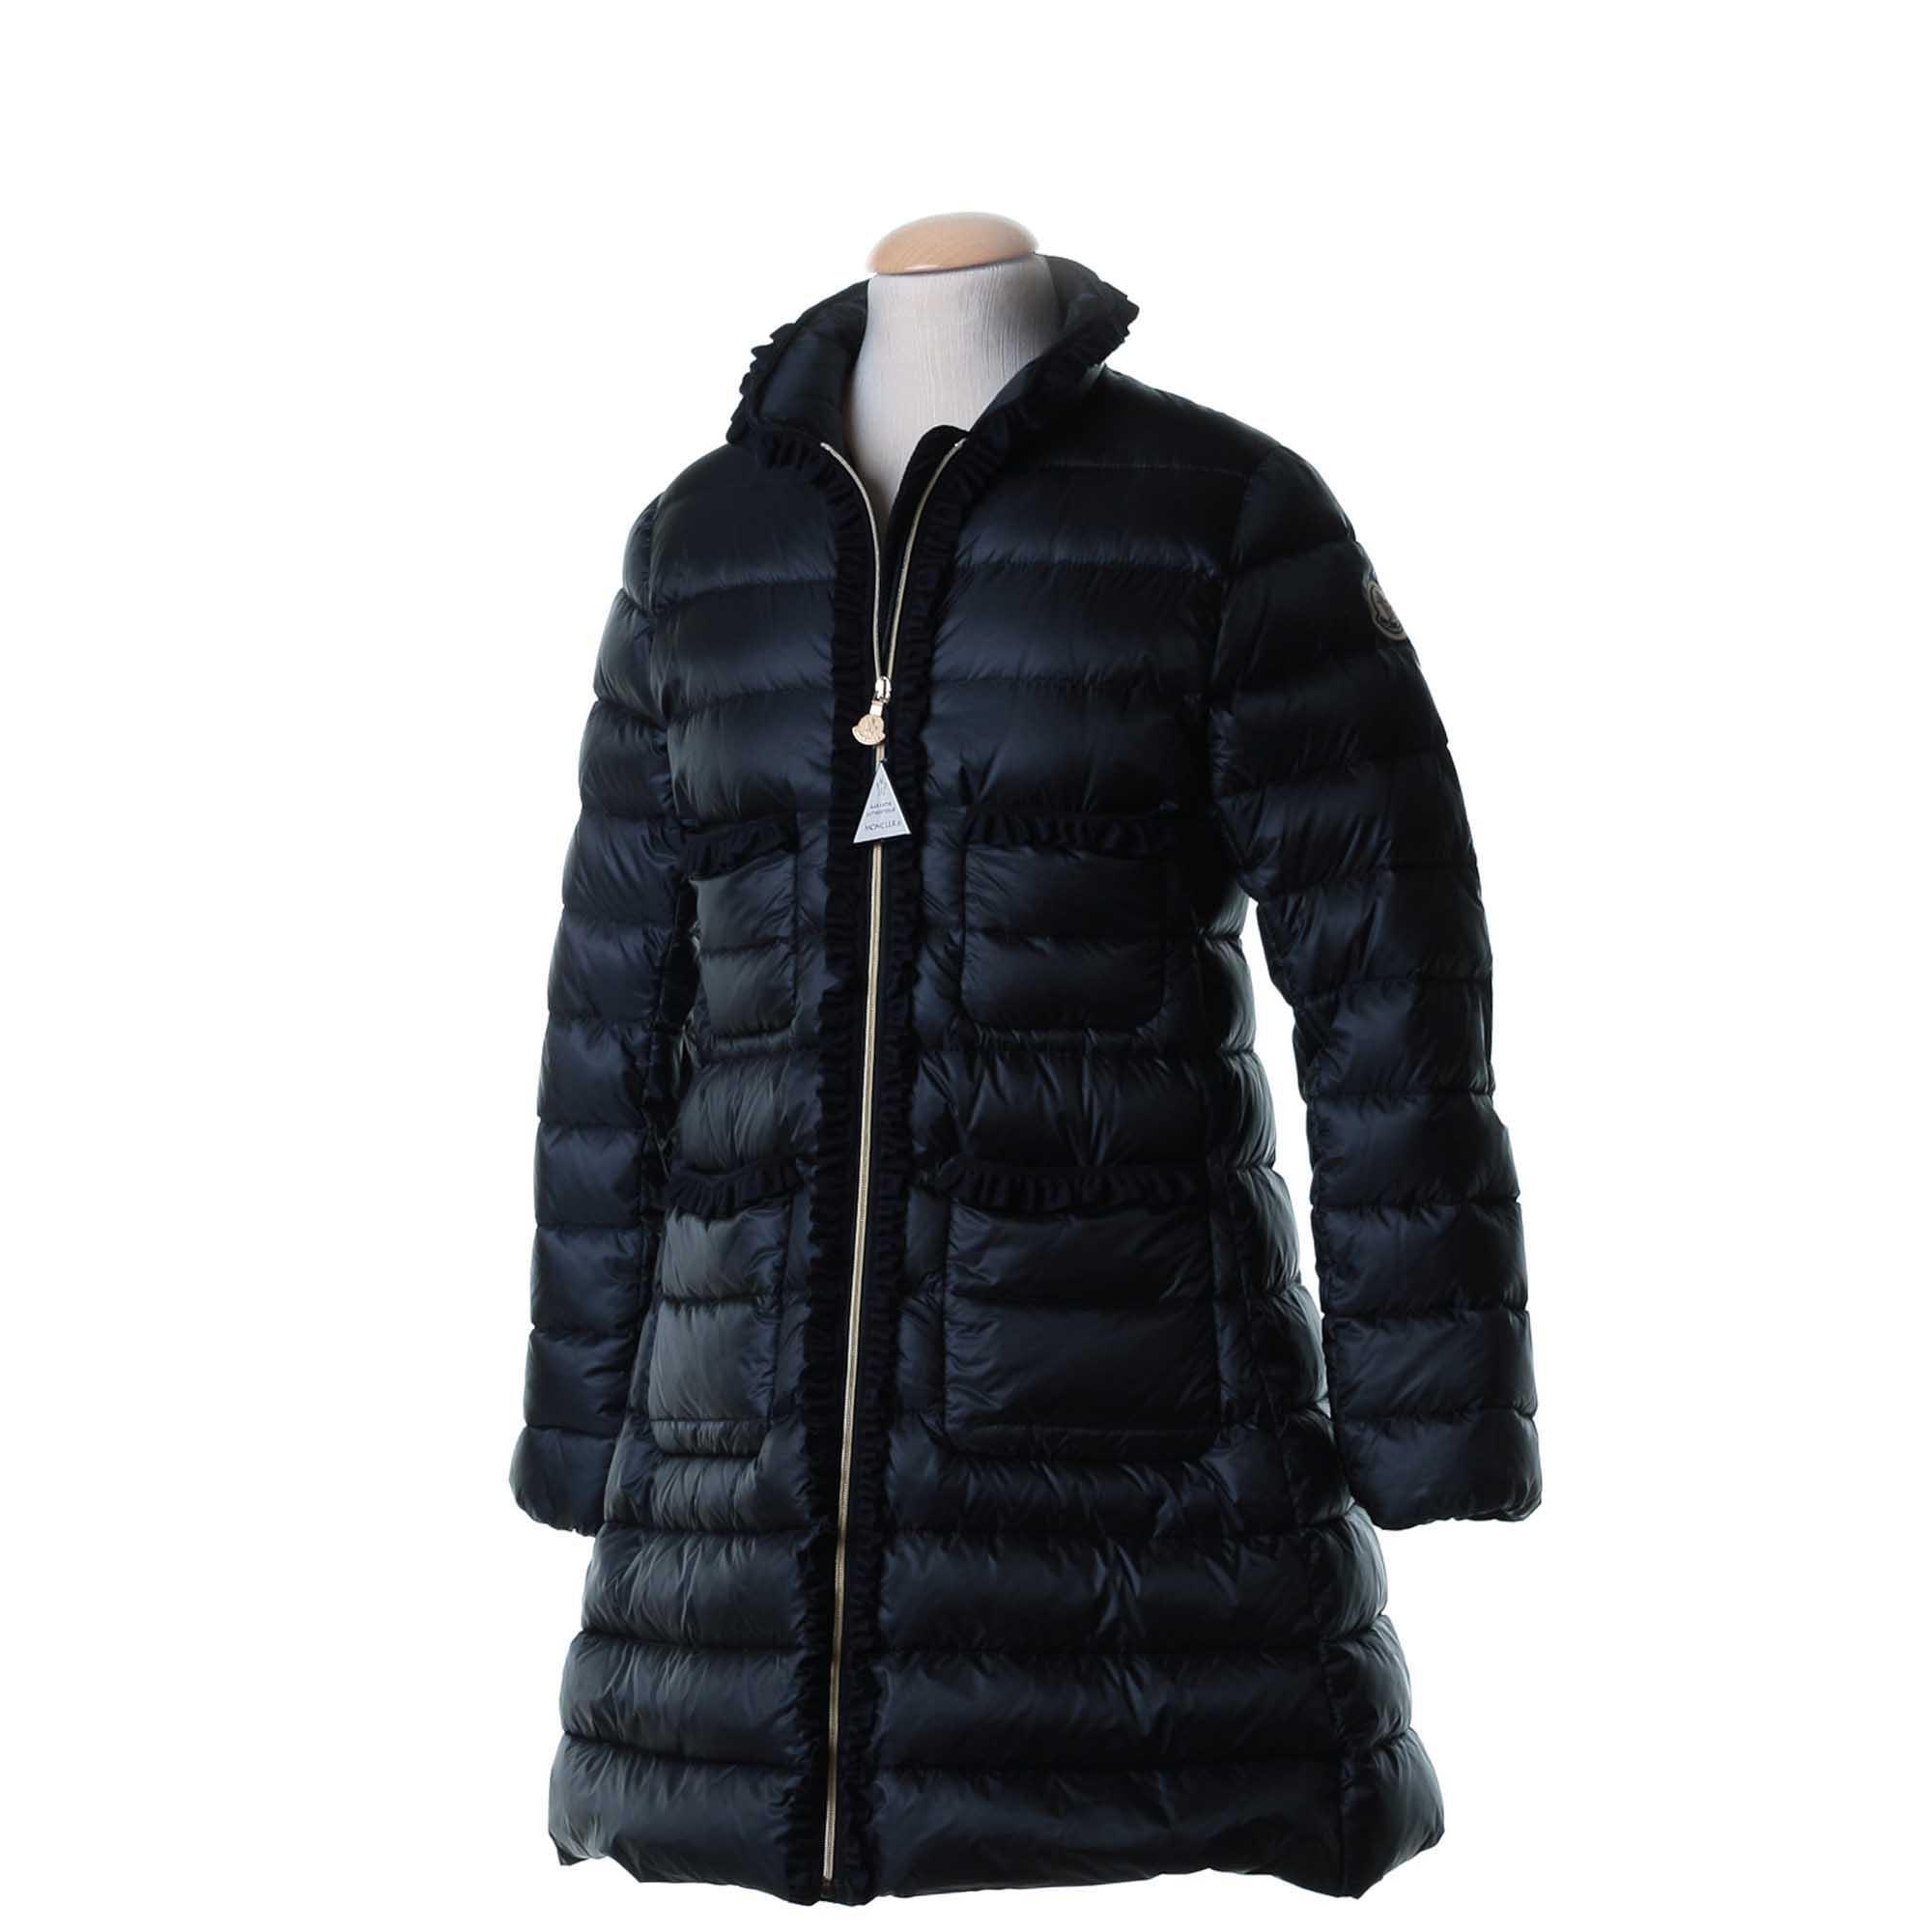 moncler piumino lana